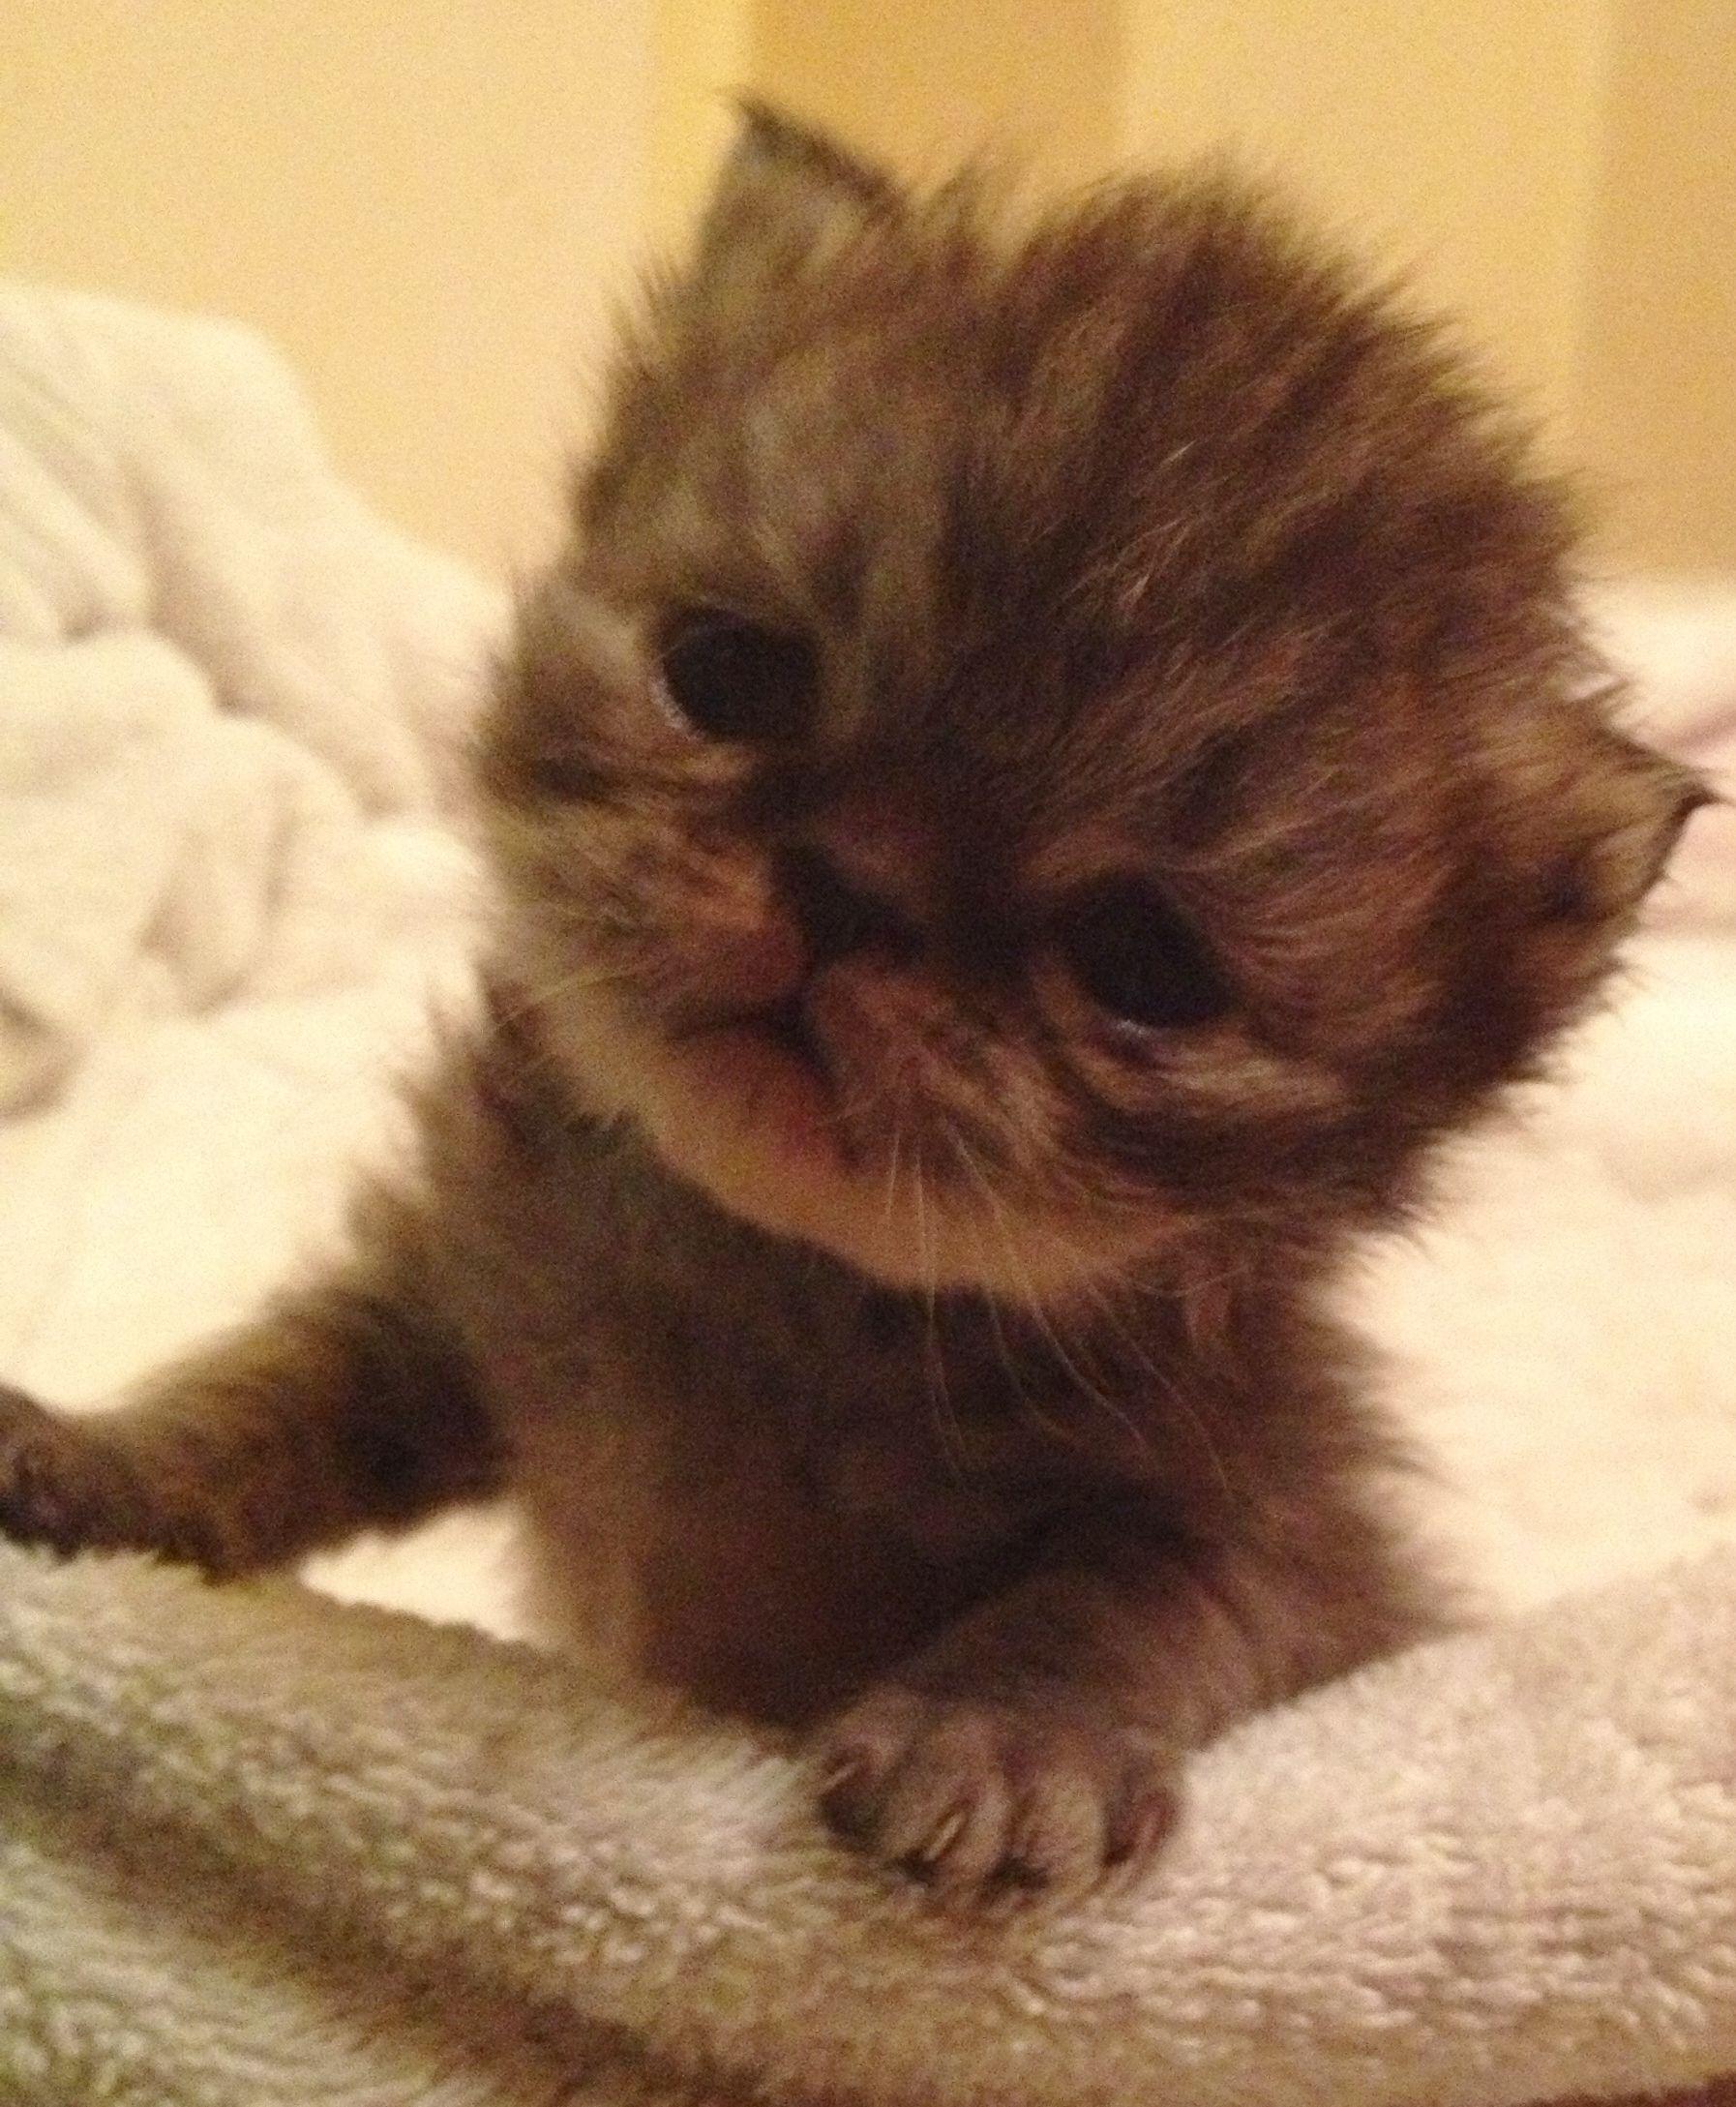 So Cute Baby Kitten Cute Baby Animals Baby Kittens Kittens Cutest